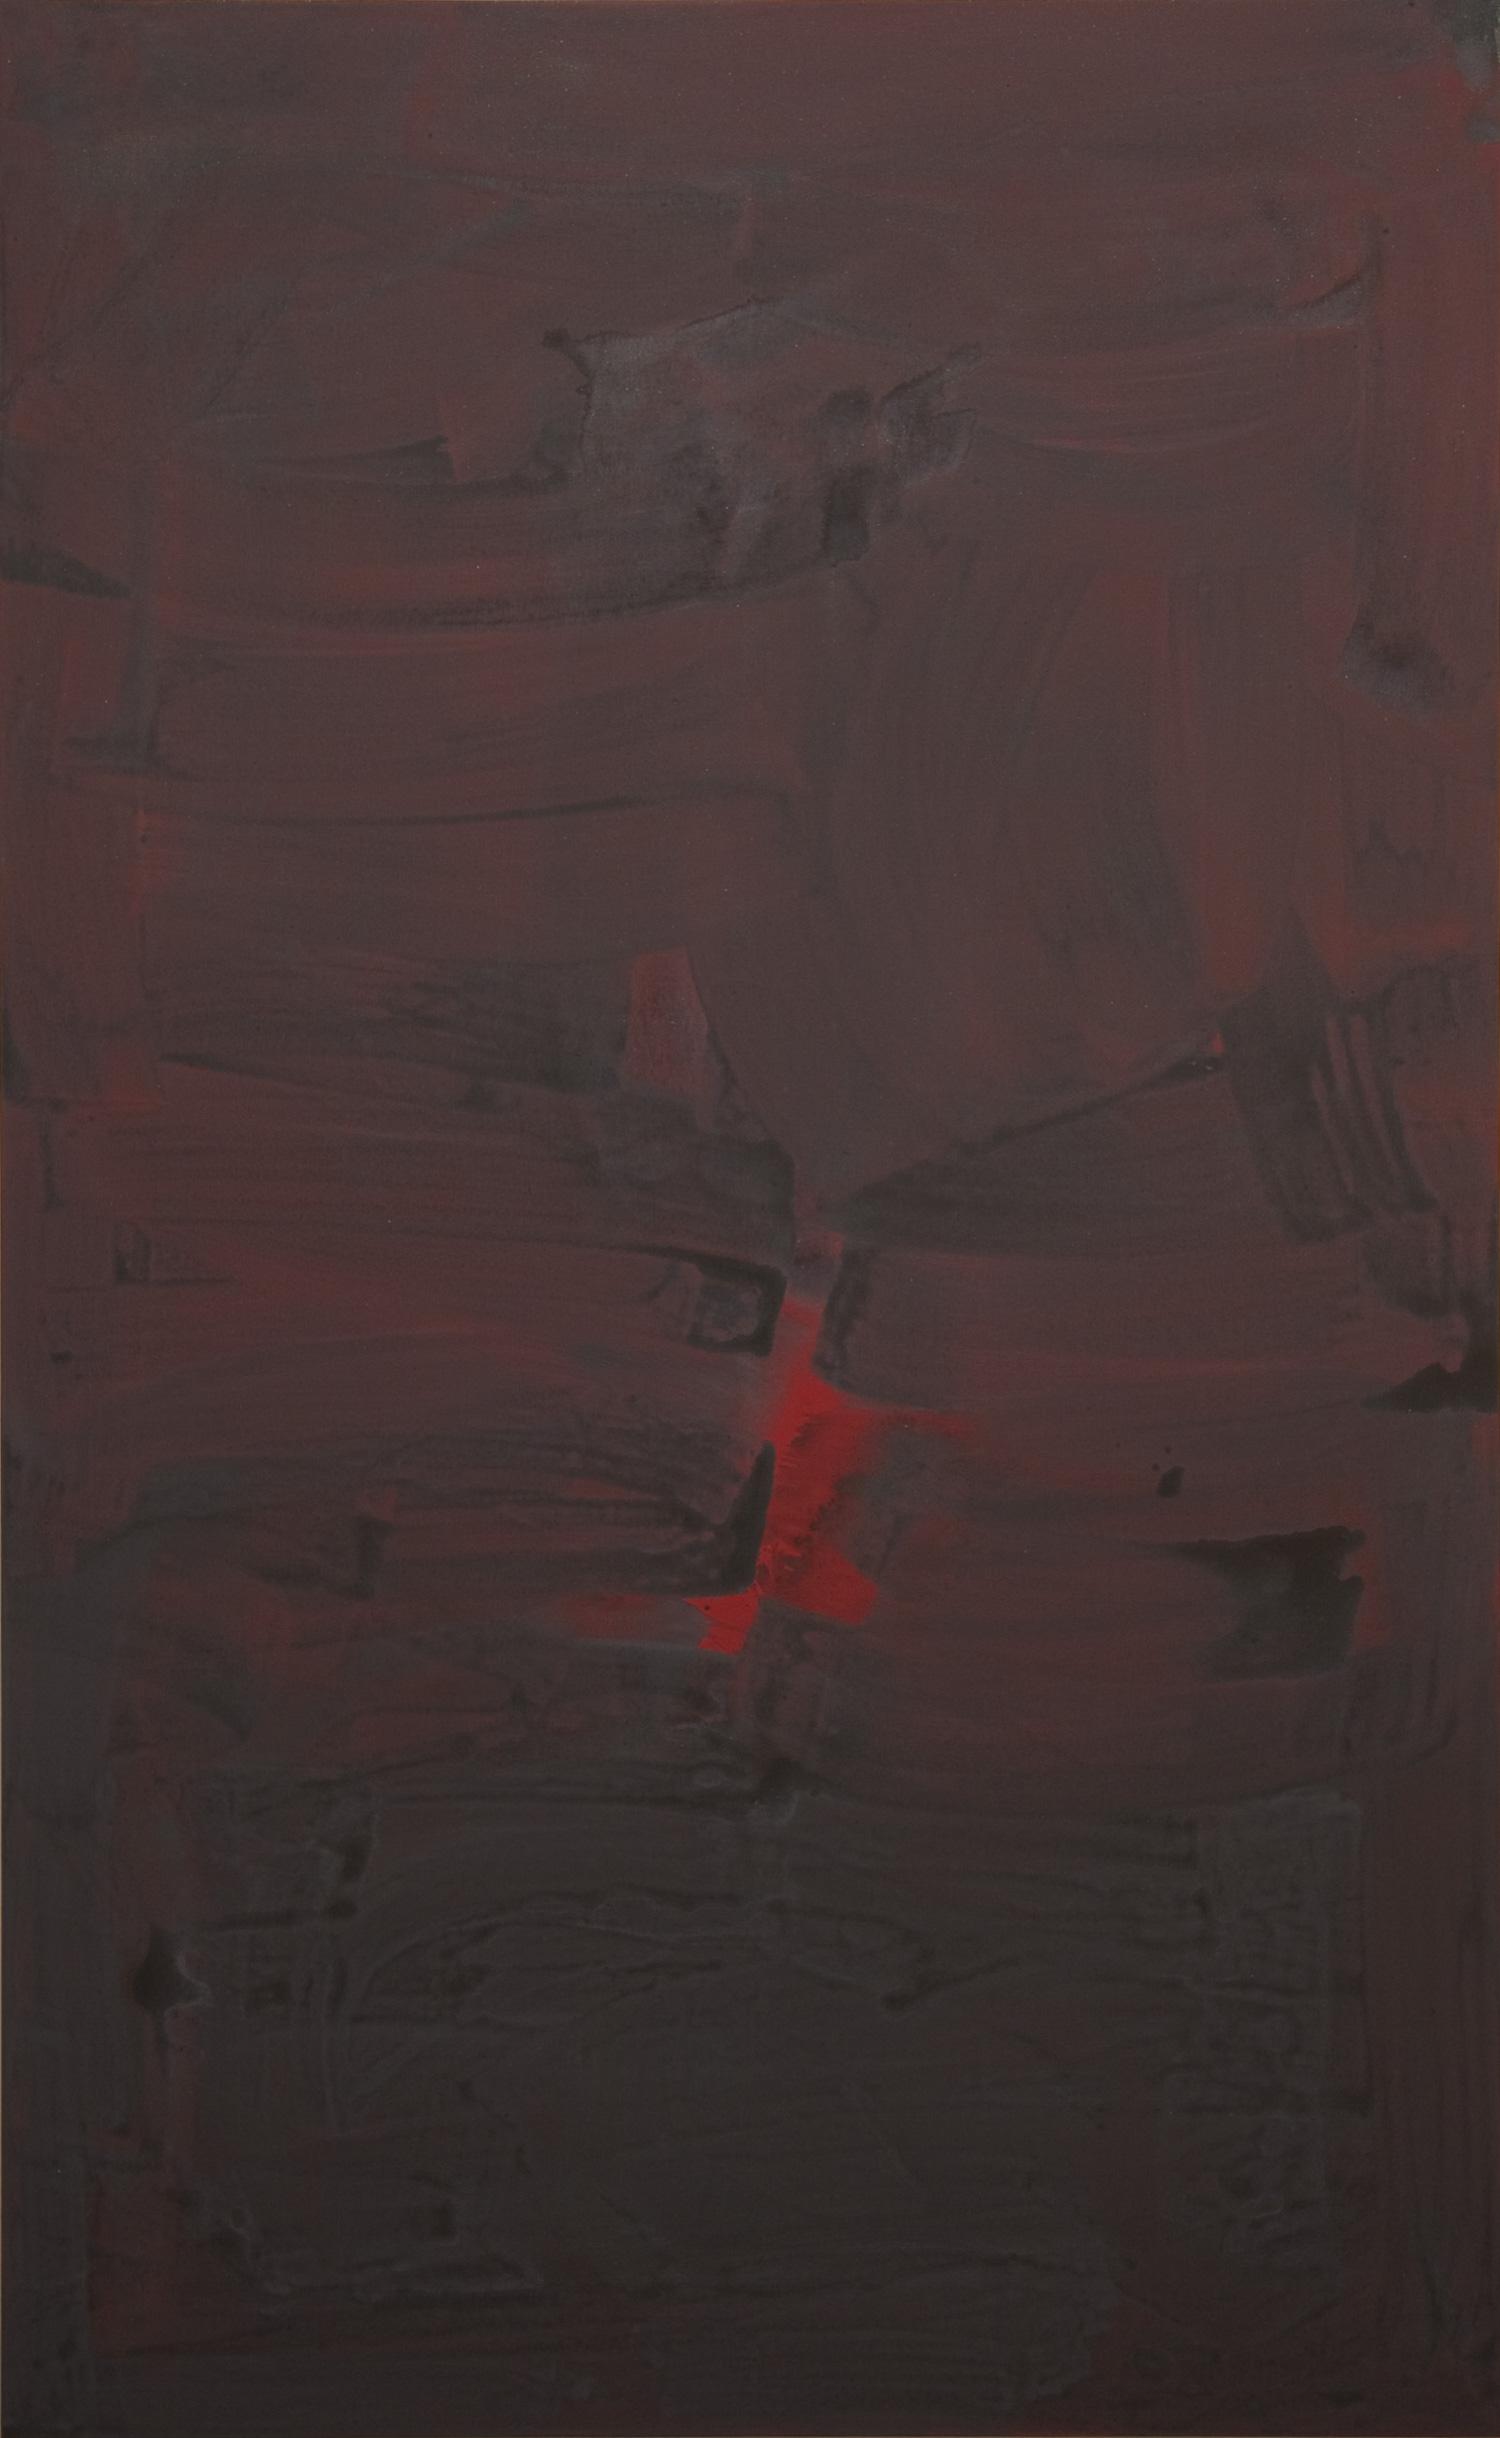 2012, acrylic on canvas, 150 x 242.5 cm (59 x 95 1/2 in)